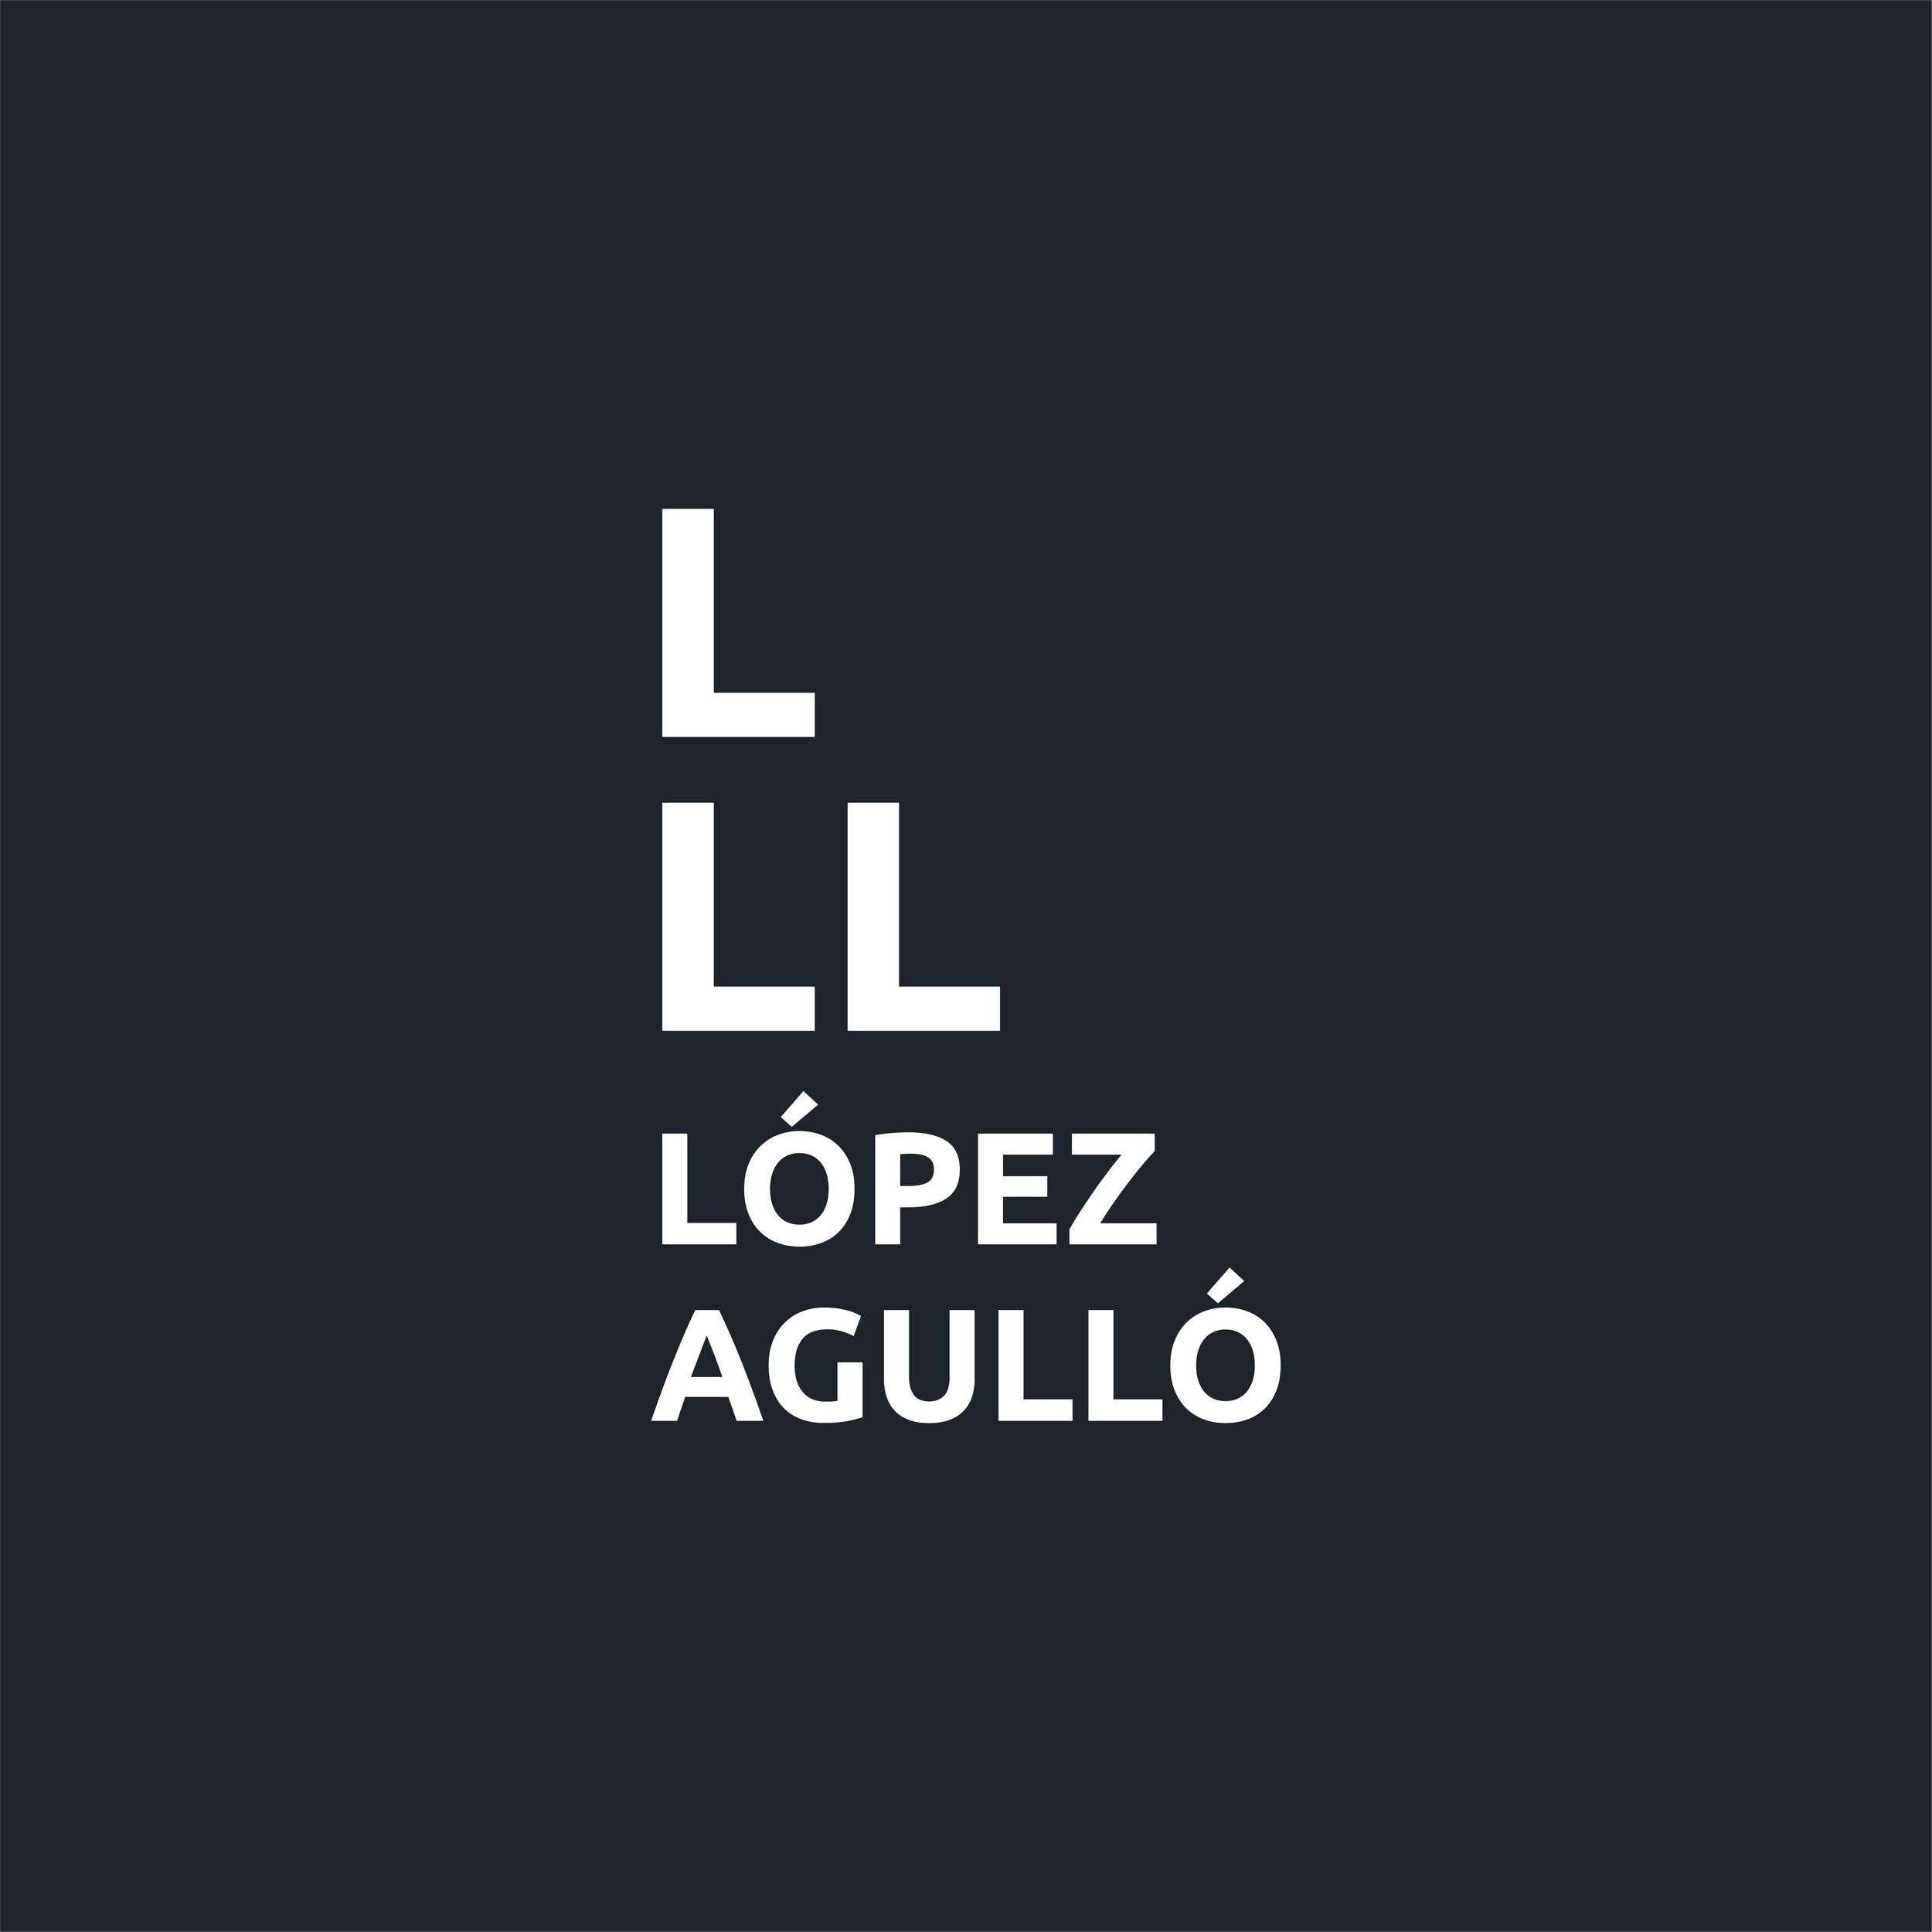 Superfluido - López Agulló1.png